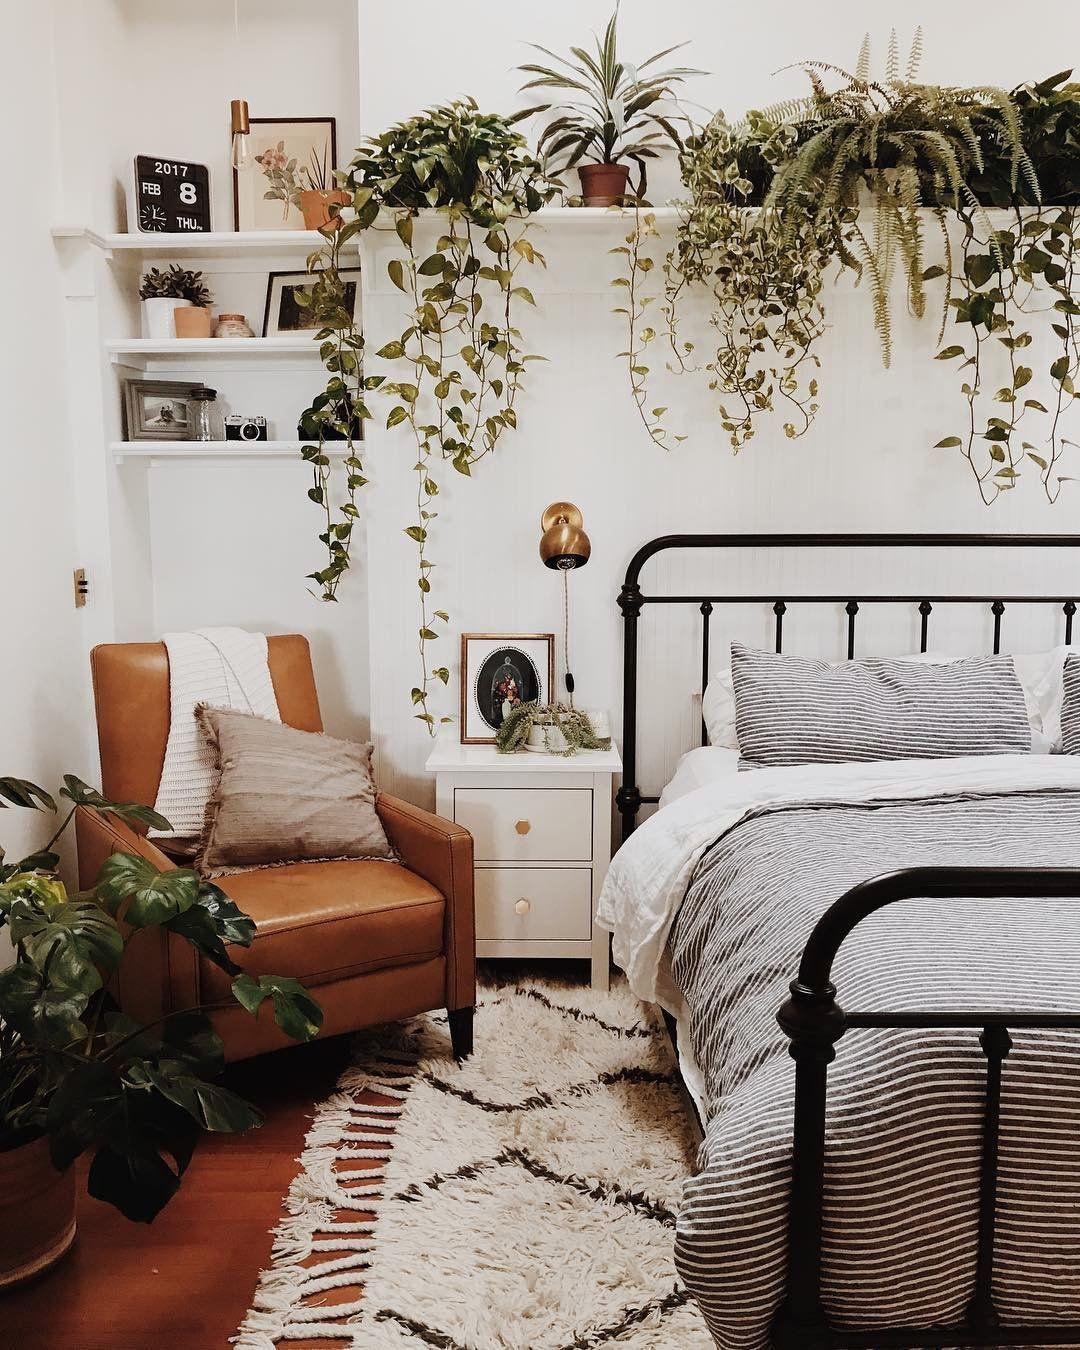 Schoolhouse Living Branch Abode Bedroom Decor Bedroom Makeover Bedroom Design Cute bedroom ideas plants